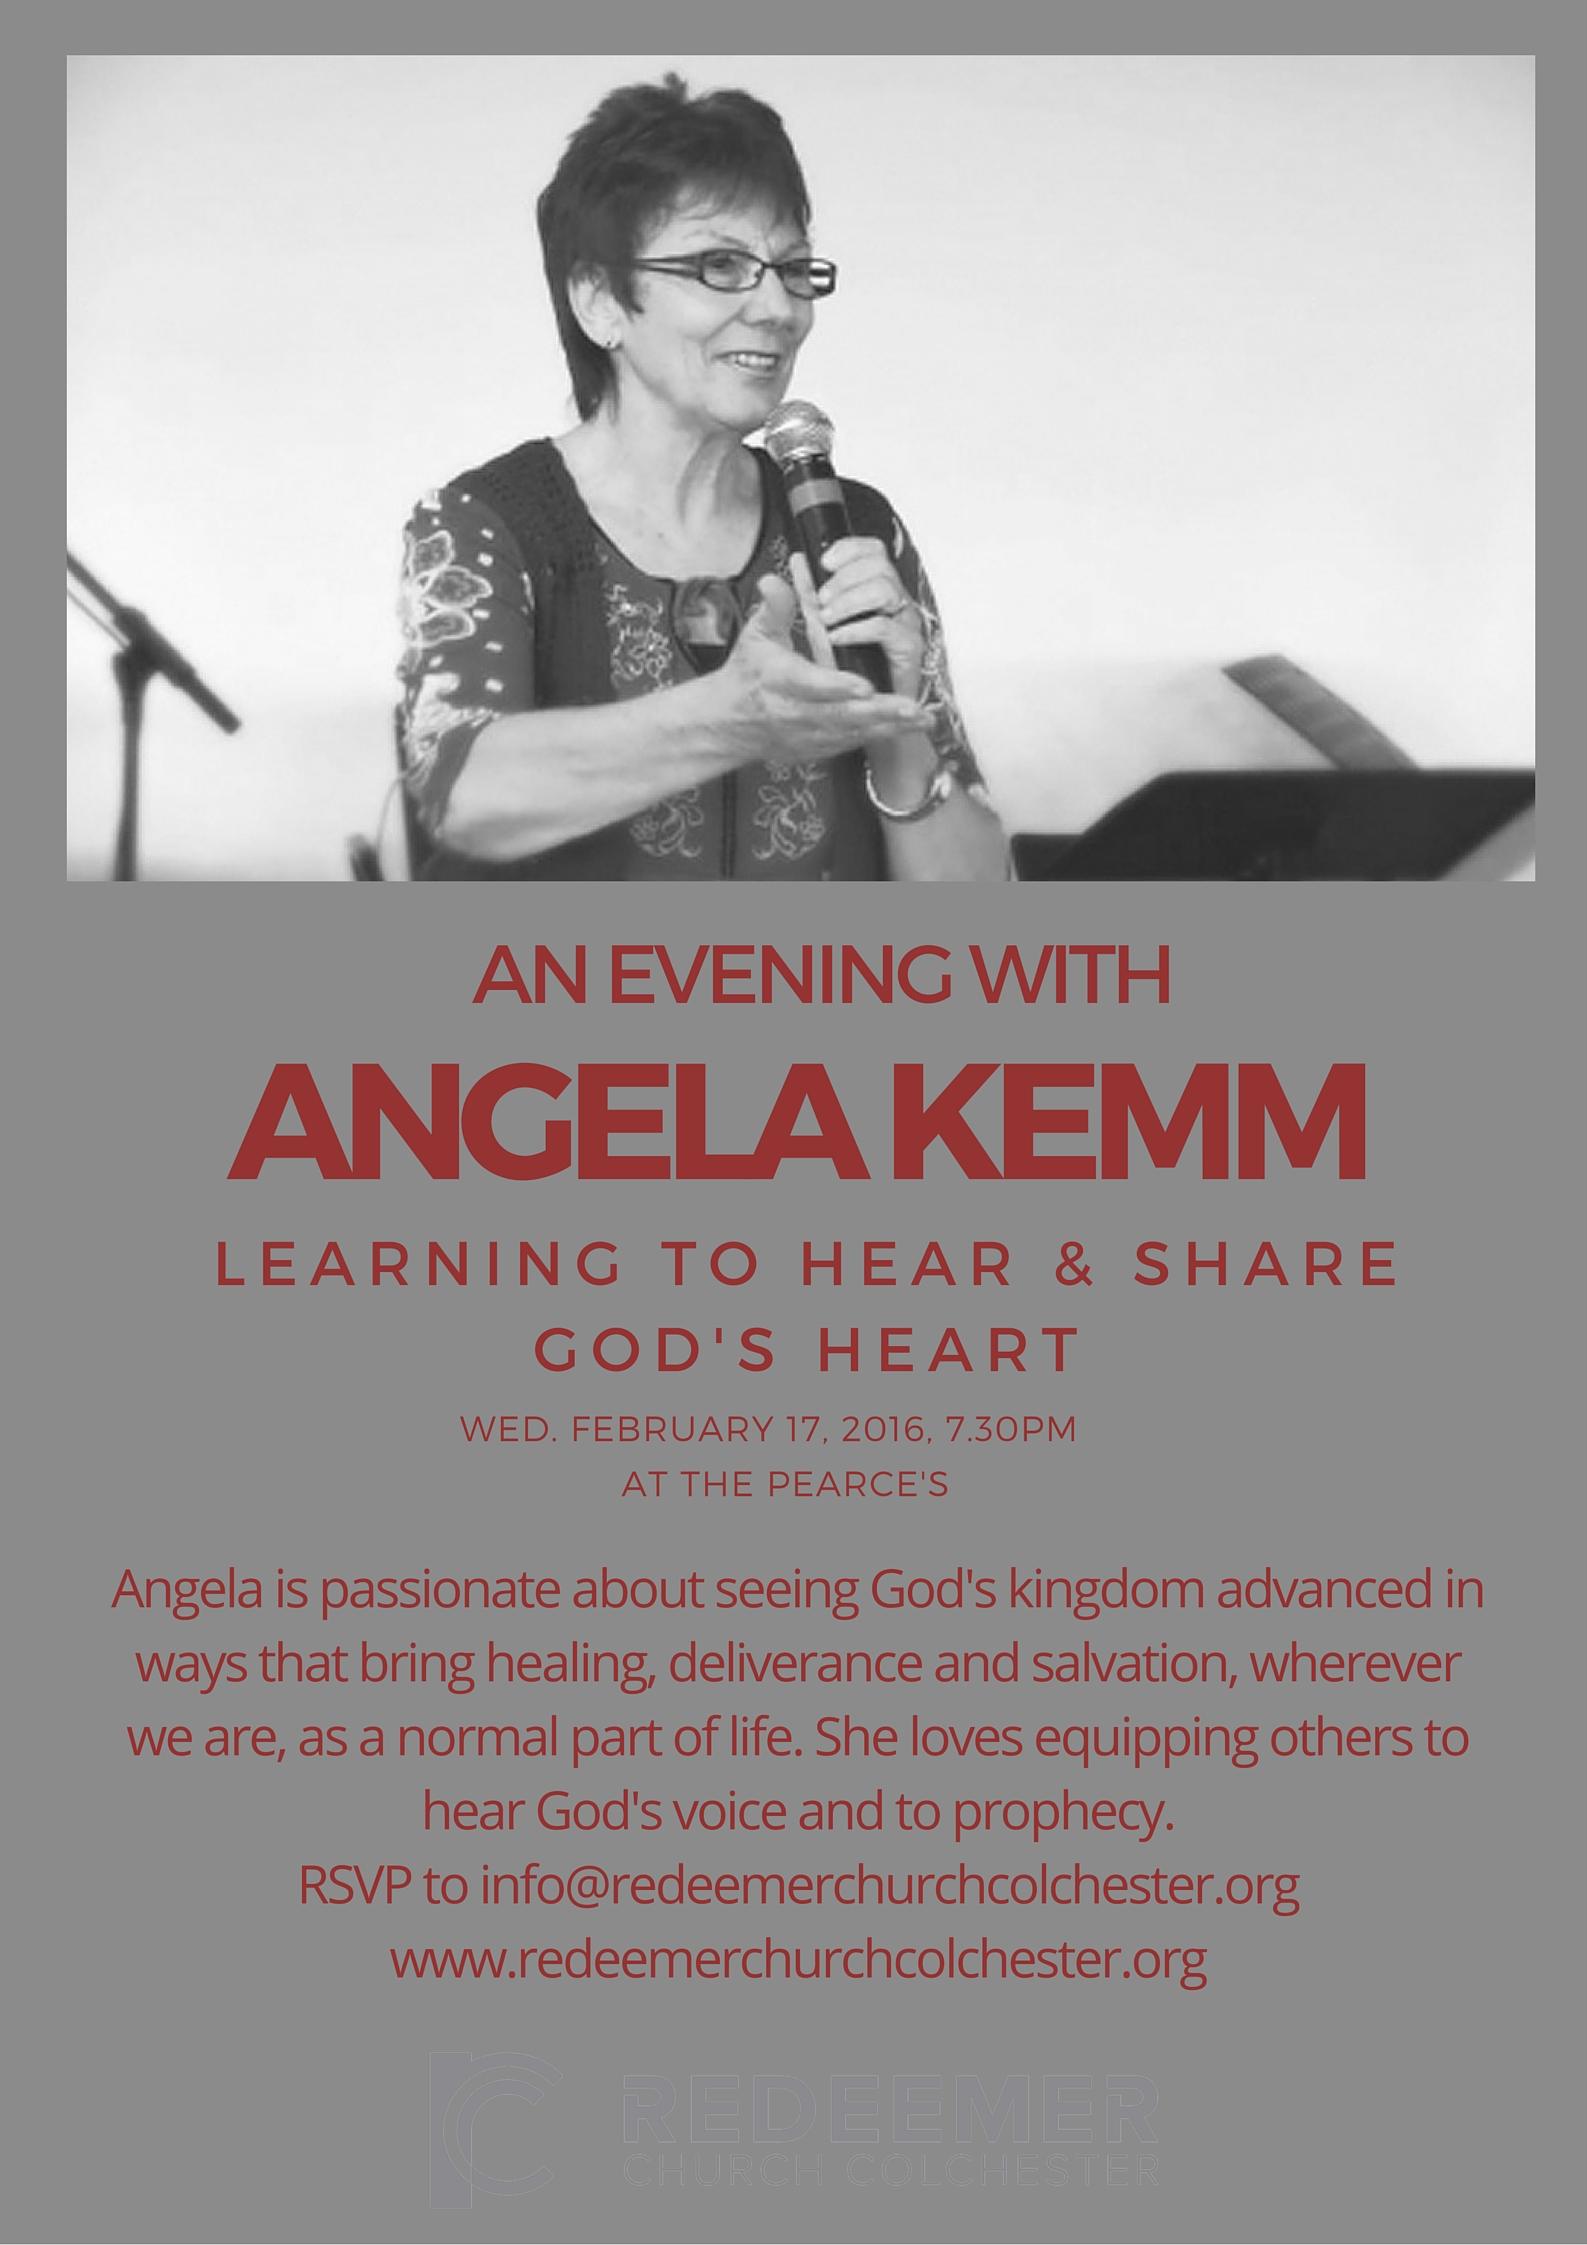 Angela Kemm Event Poster (Red) - Feb 2016.jpg